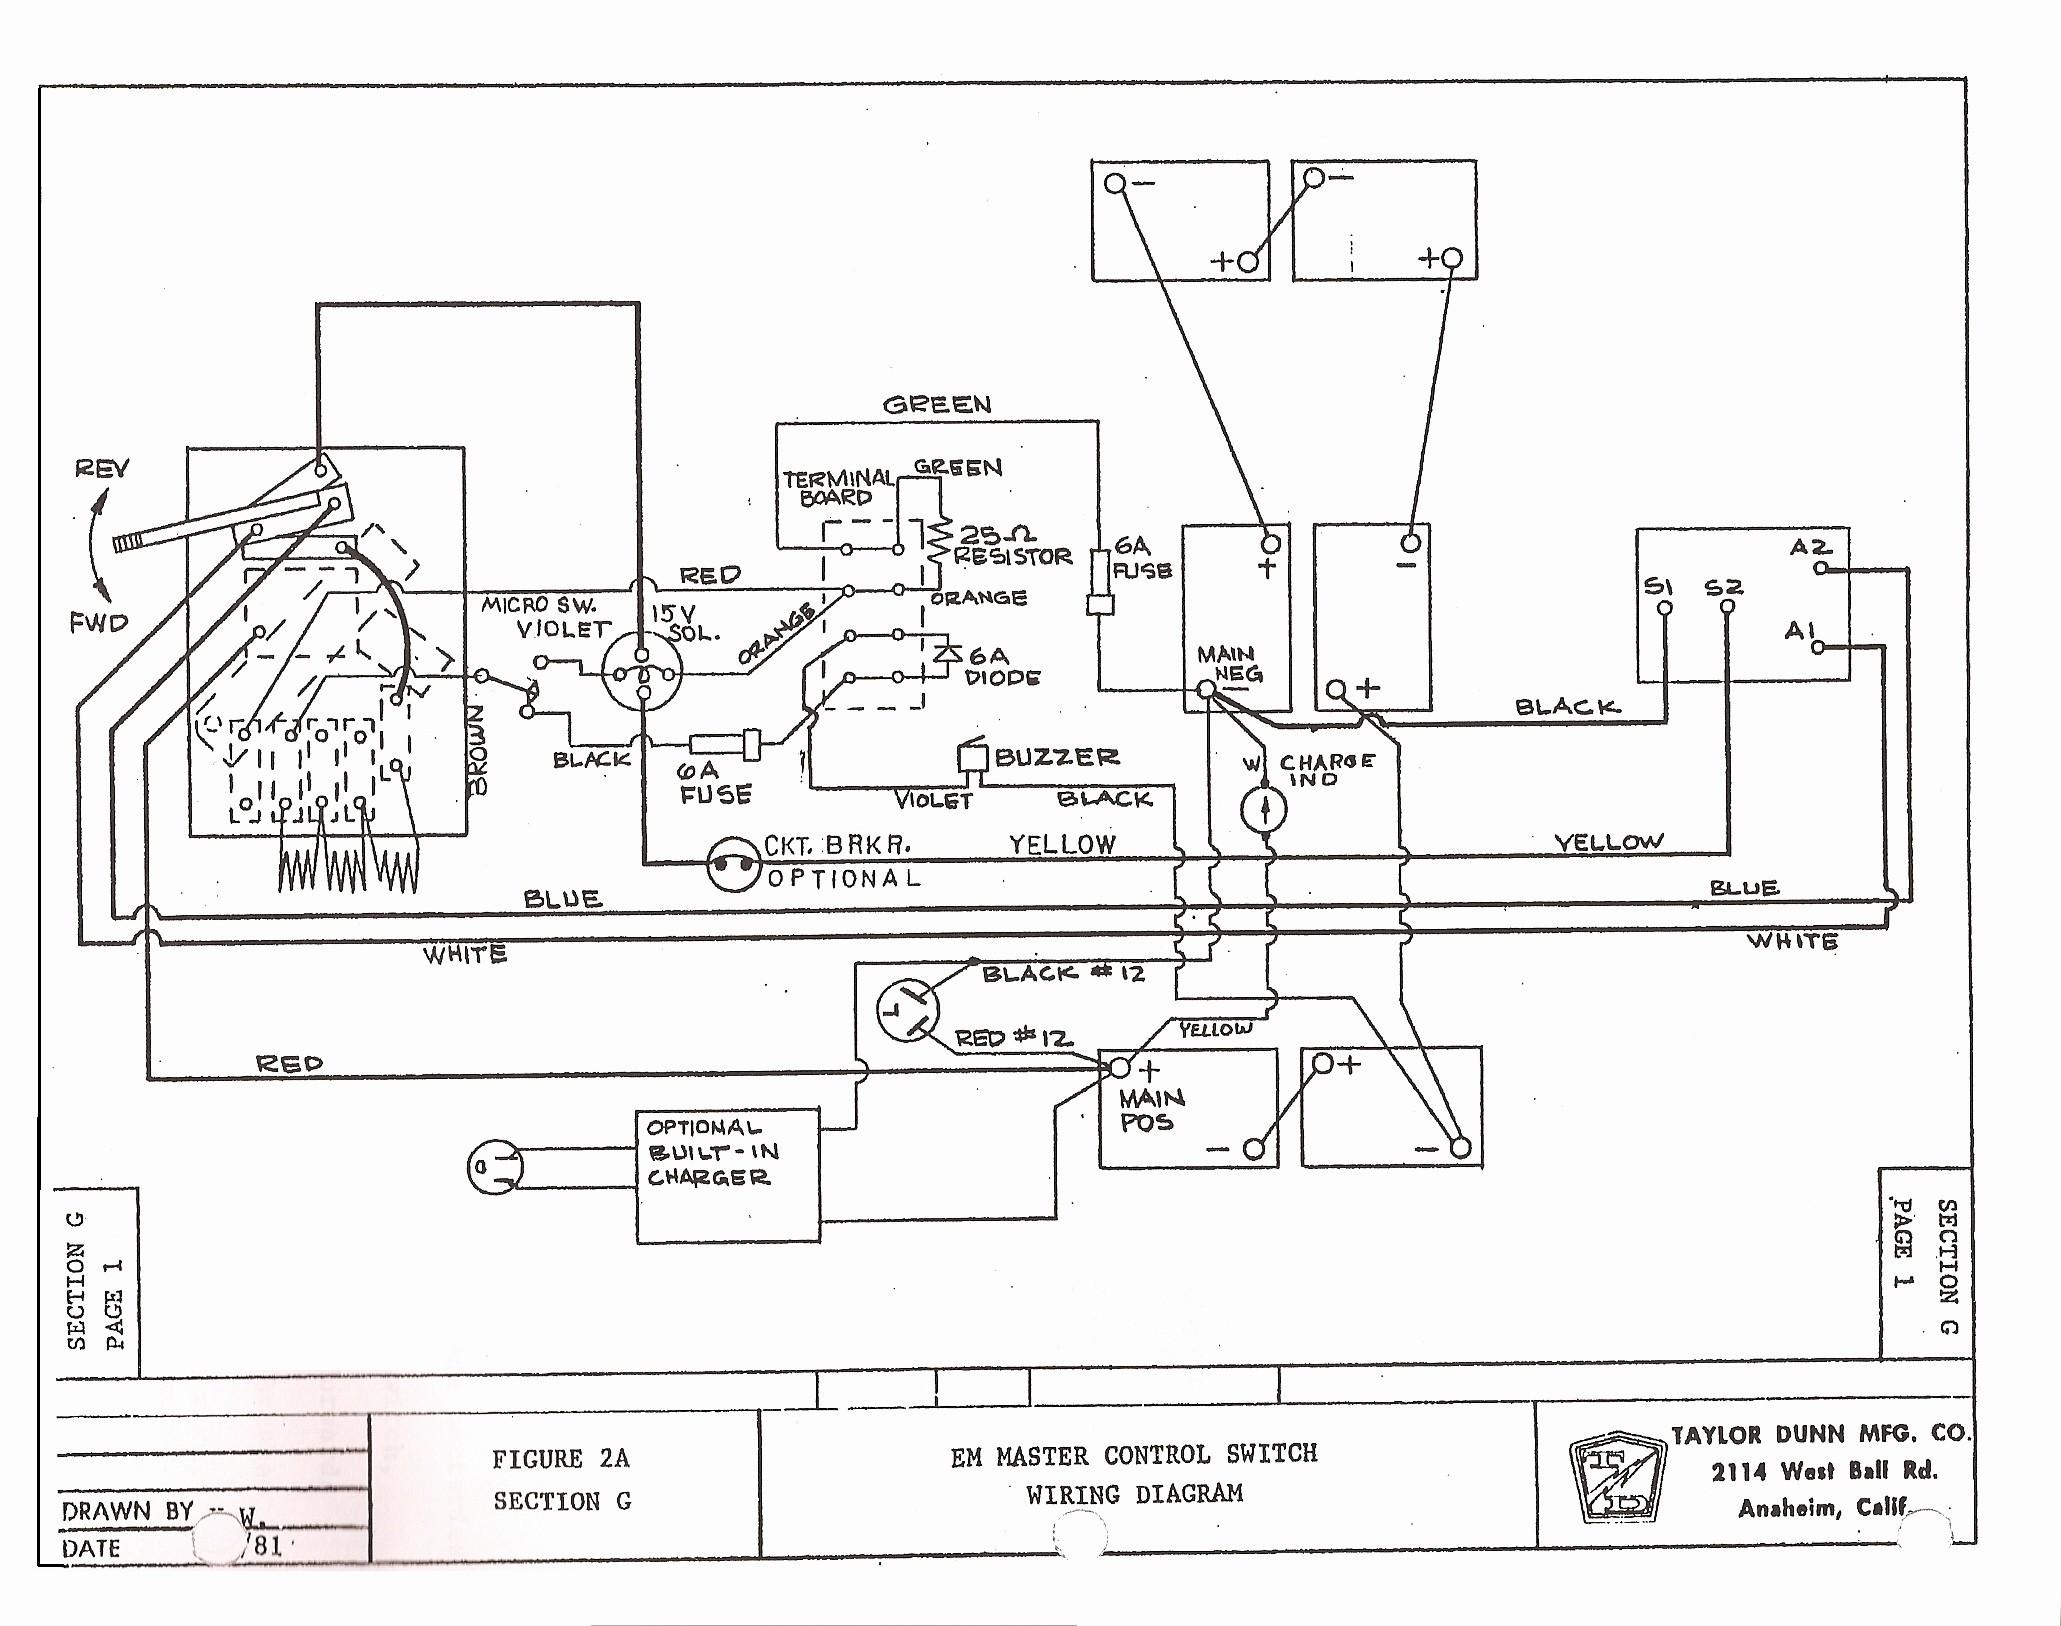 Ez Go Golf Cart Battery Wiring Diagram Car Diagram Excelent Club Car Wiring Diagram 36 Volt 1995 Club Car Of Ez Go Golf Cart Battery Wiring Diagram